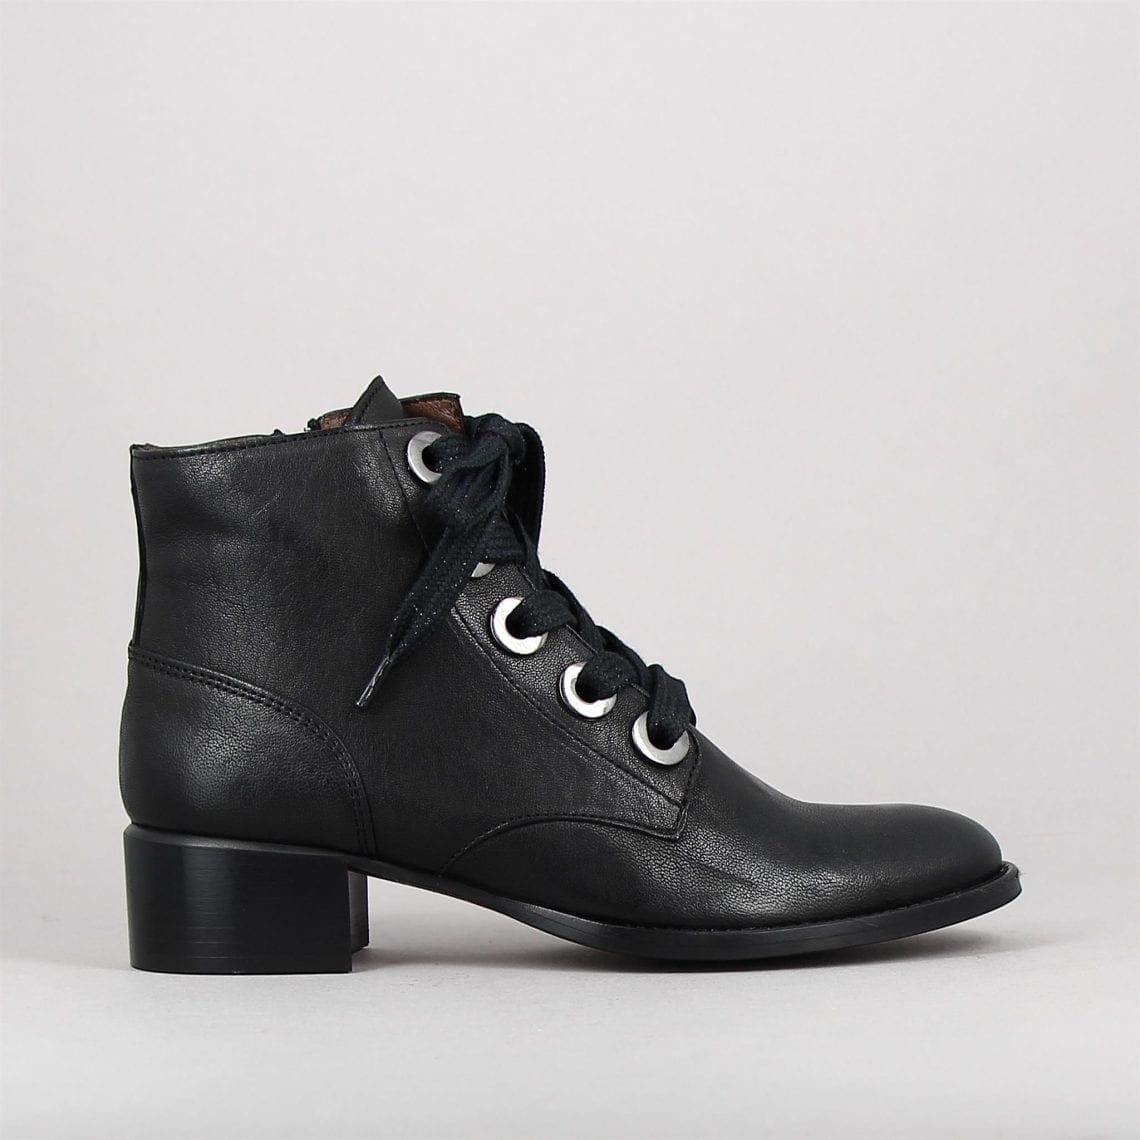 ando-noir-158433282-0.jpg